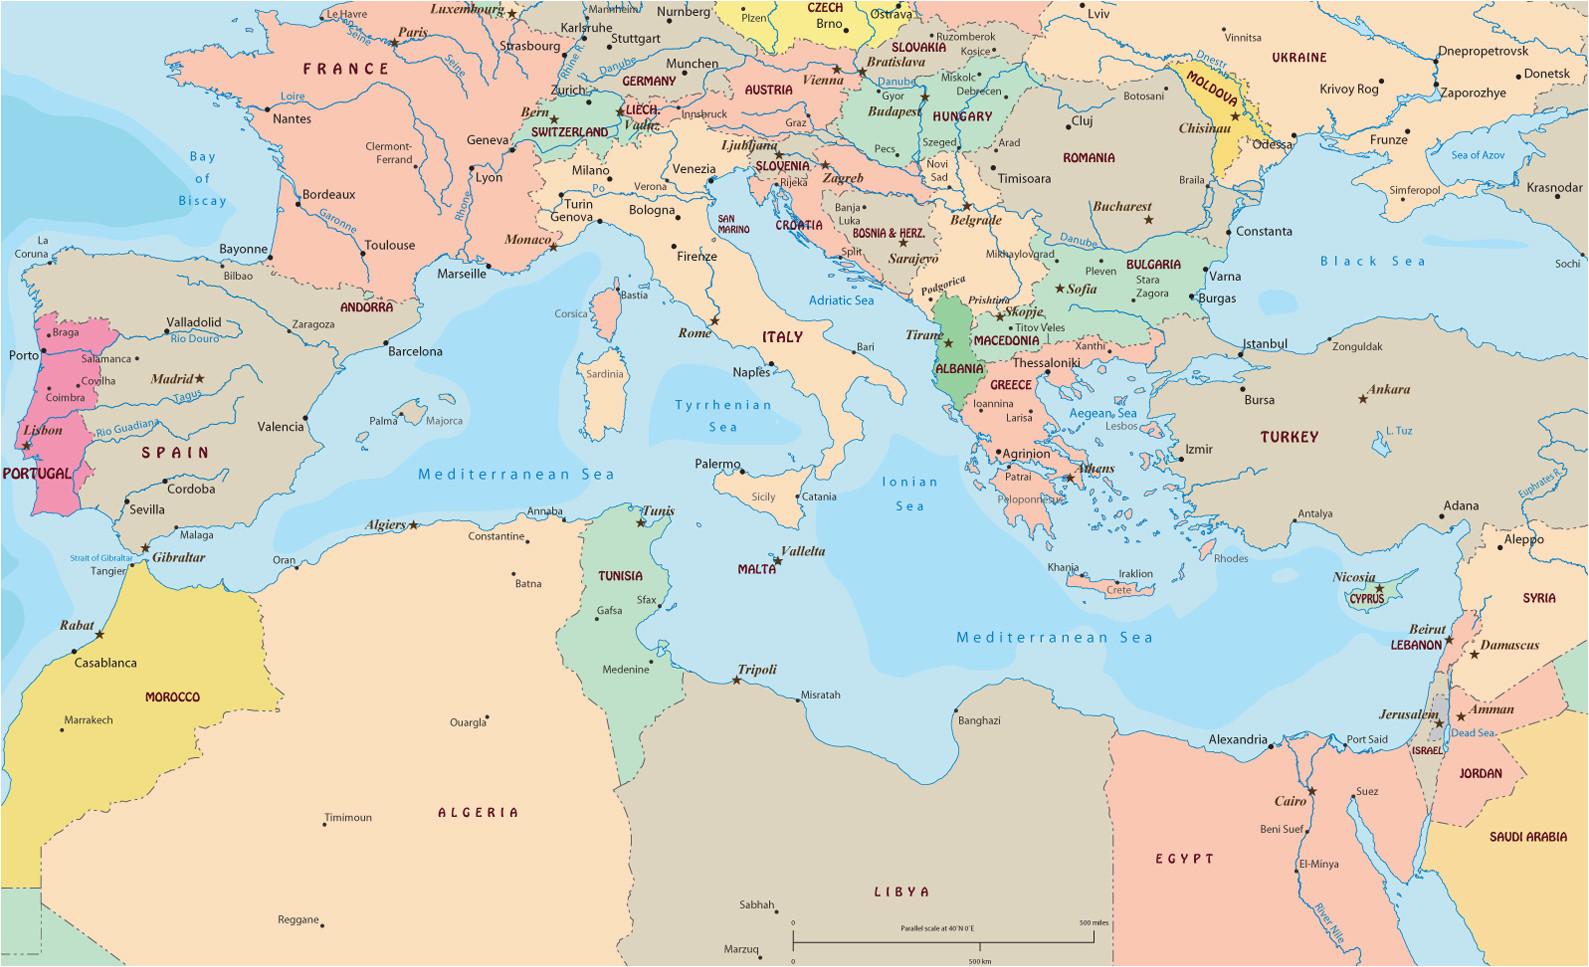 political map of mediterranean sea region